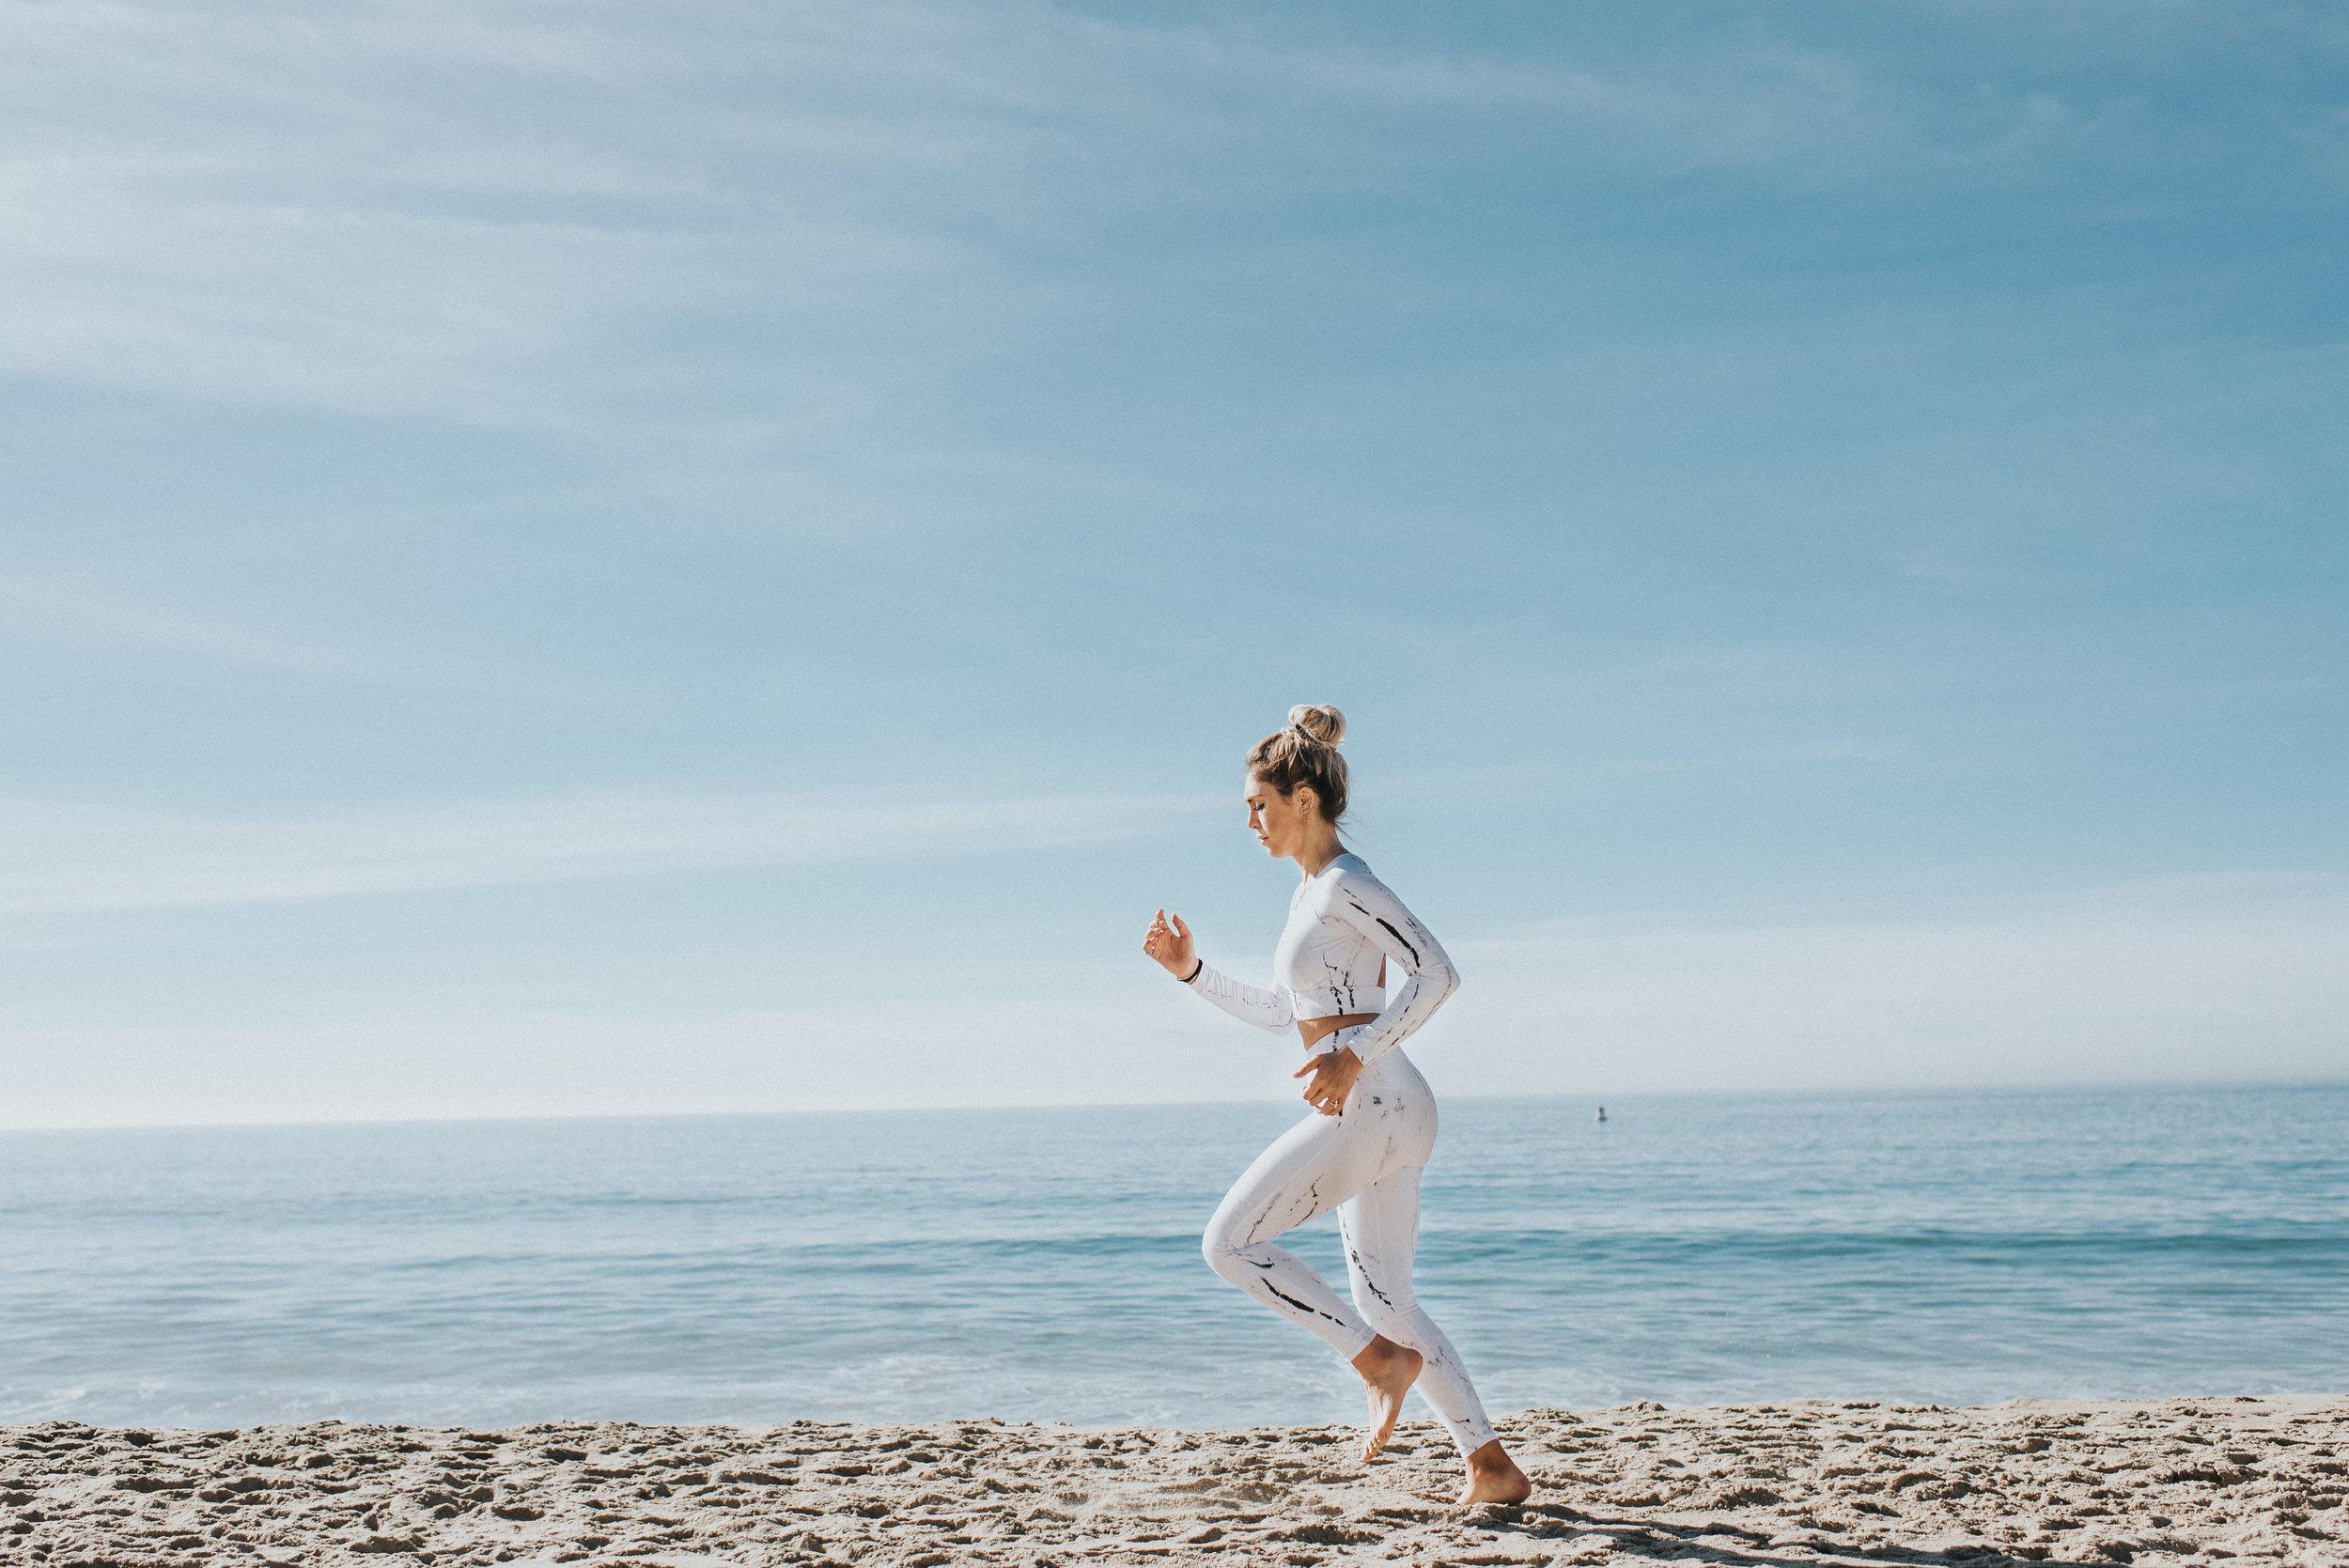 Running in the sand in Laguna Beach